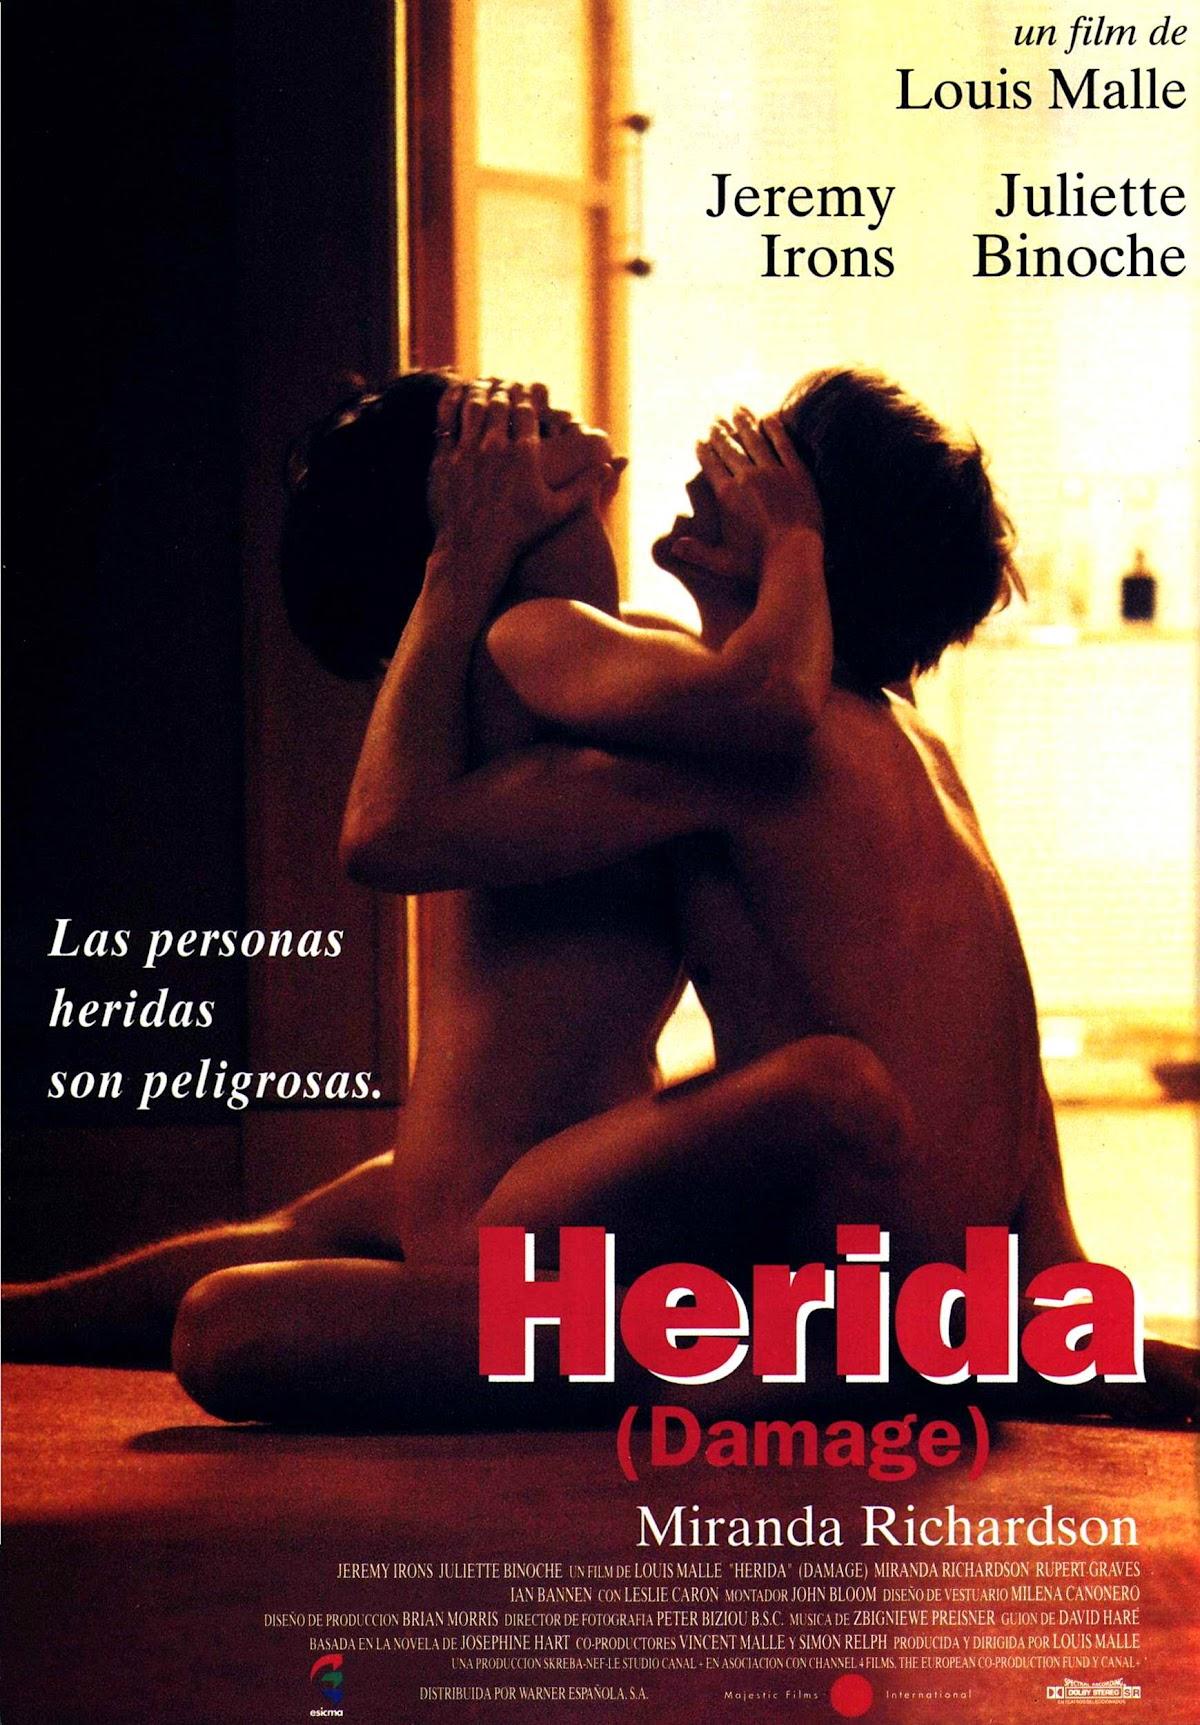 http://4.bp.blogspot.com/-uX8_zh55zbs/T25xDq8khwI/AAAAAAAADcU/blwY9DEi2YI/s1725/Damage+Spanish+poster.jpg